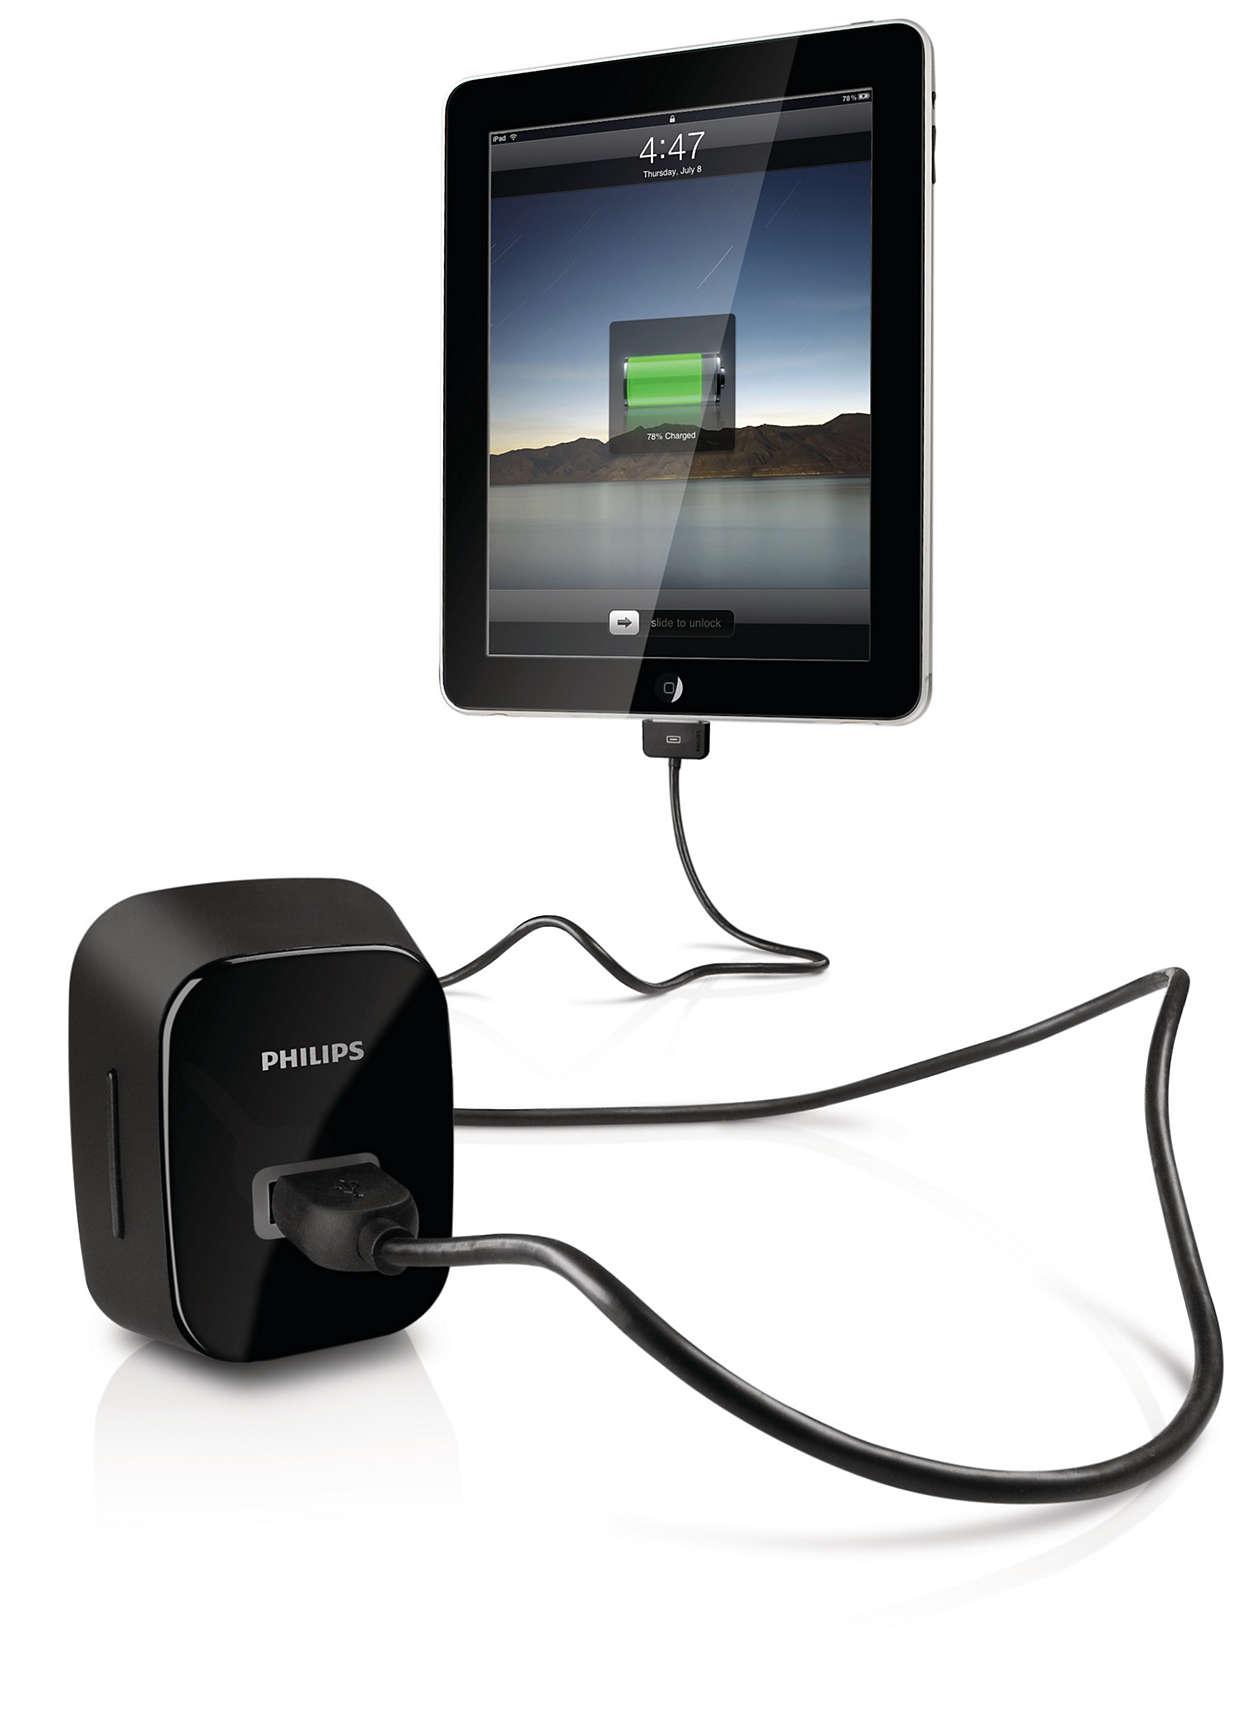 Sạc iPad, iPhone, iPod của bạn